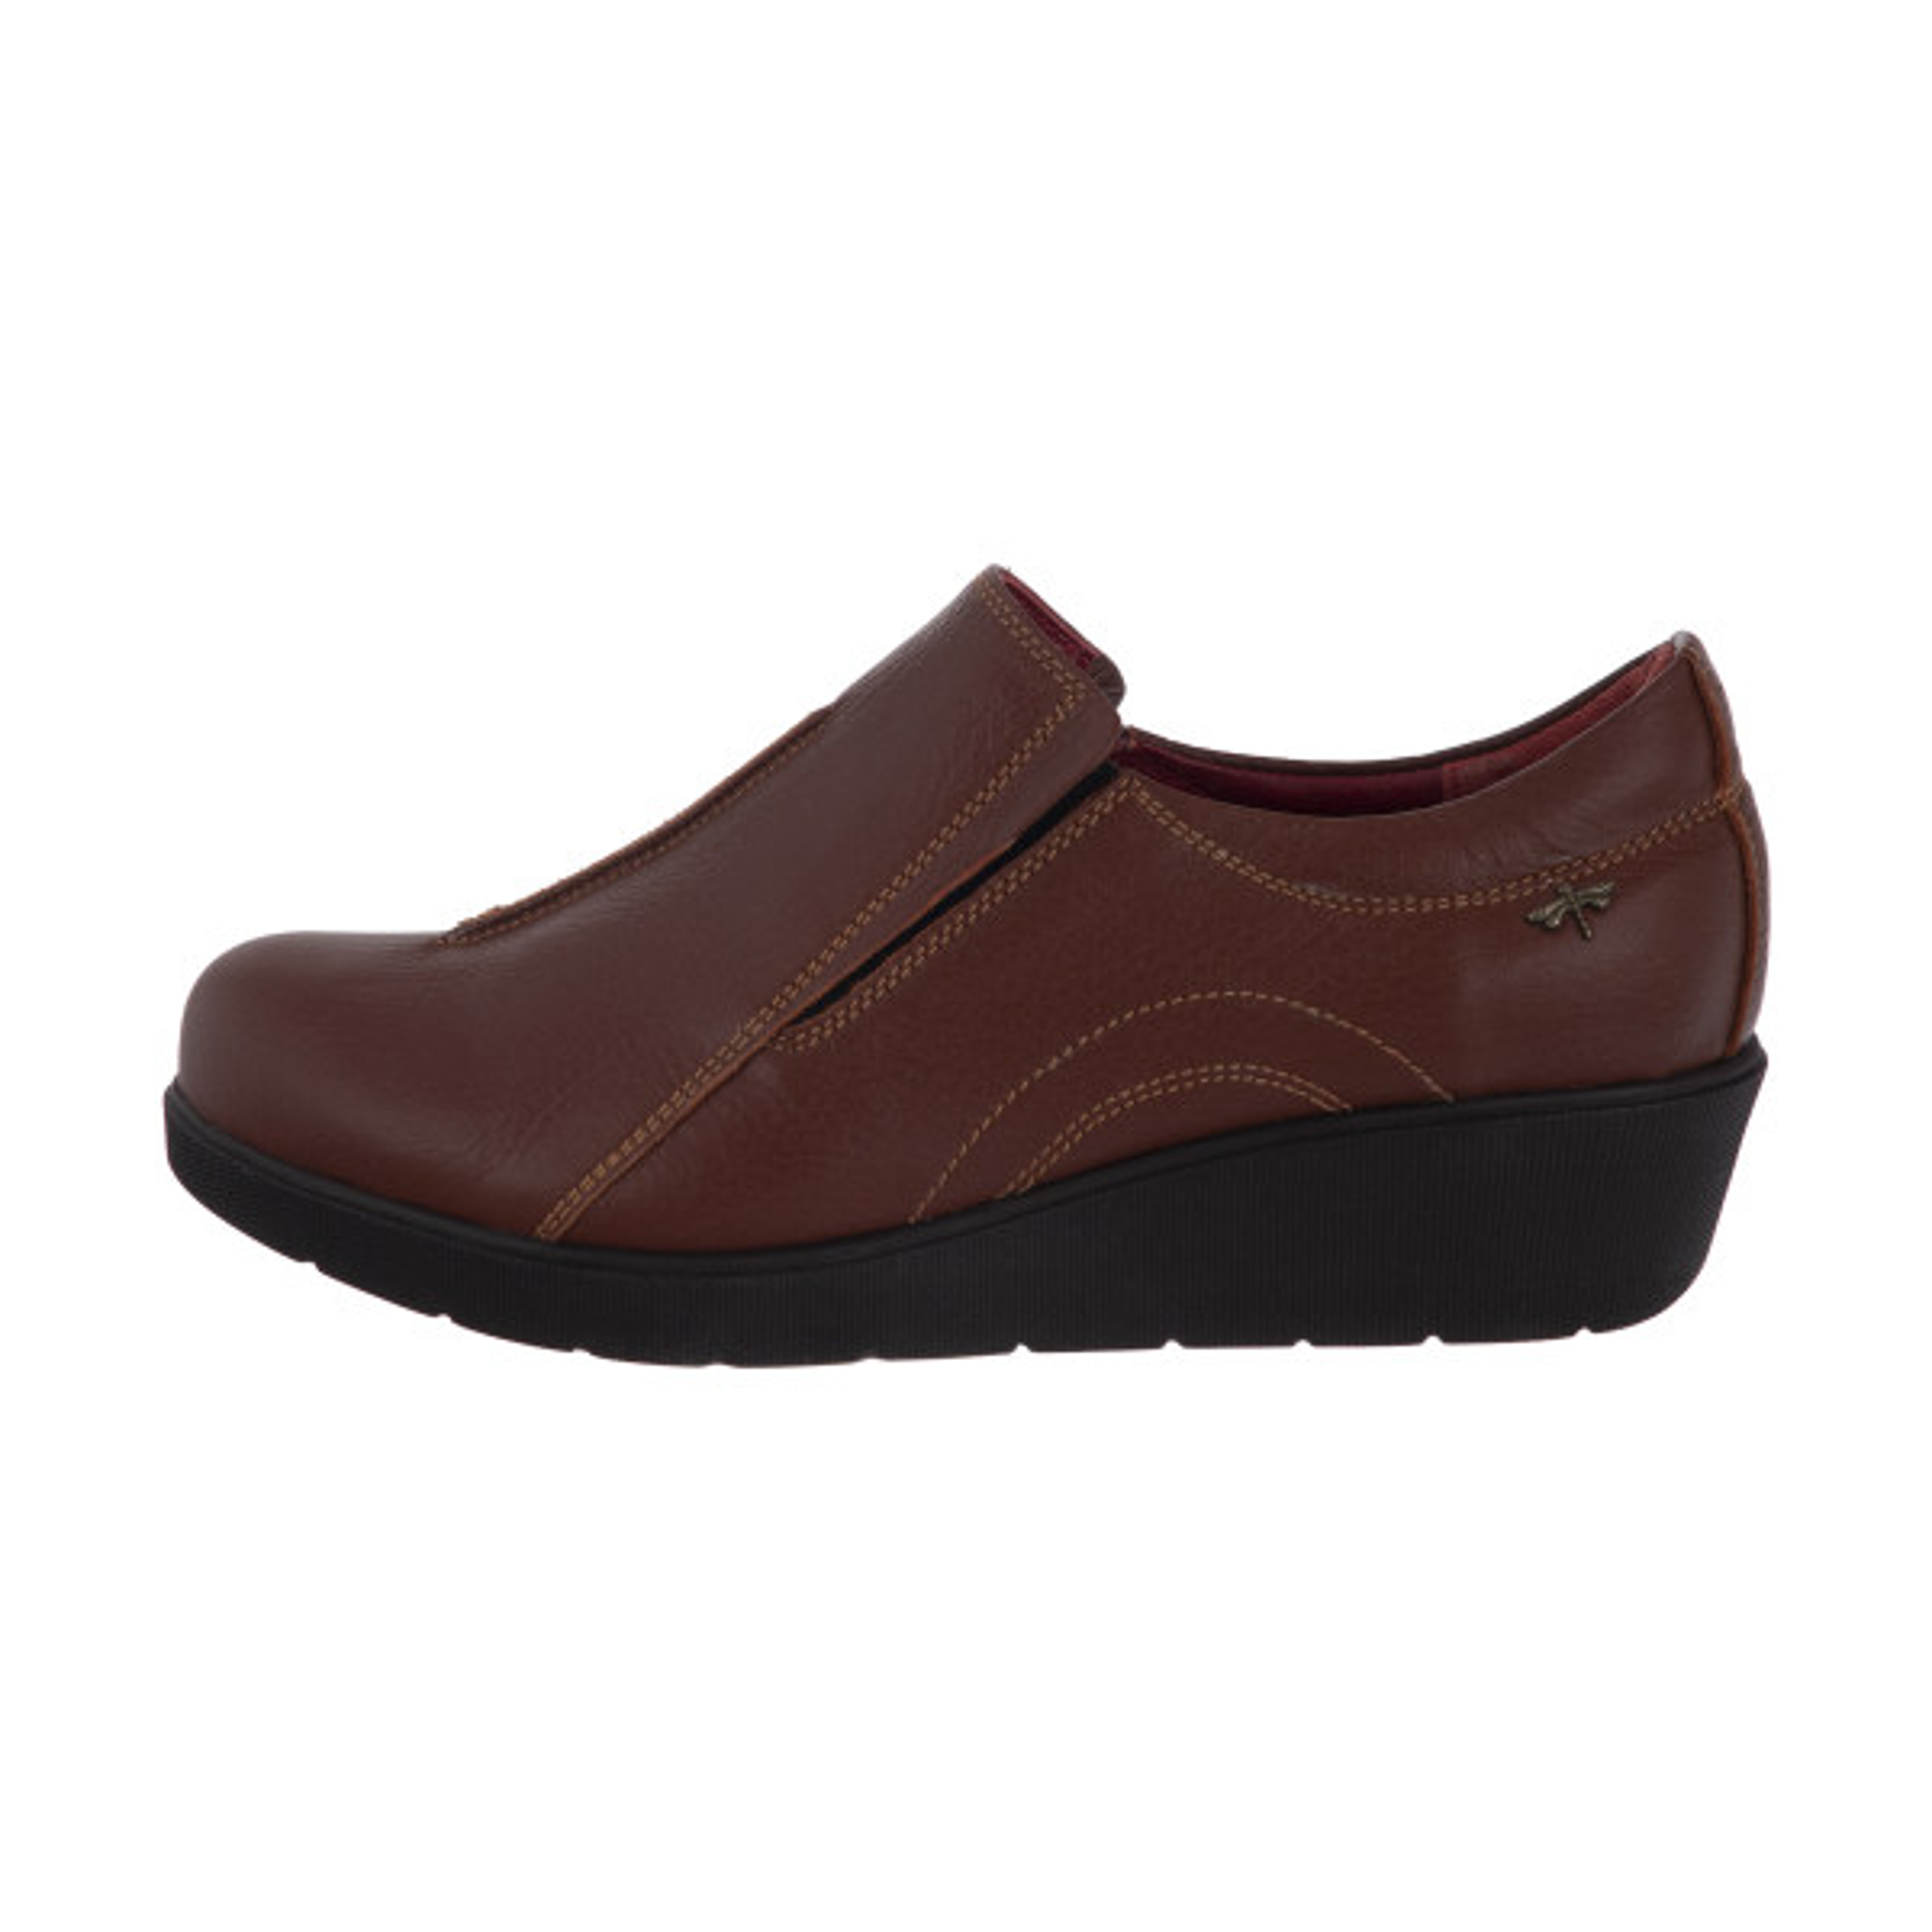 کفش روزمره زنانه ریمکس مدل 5433A500136